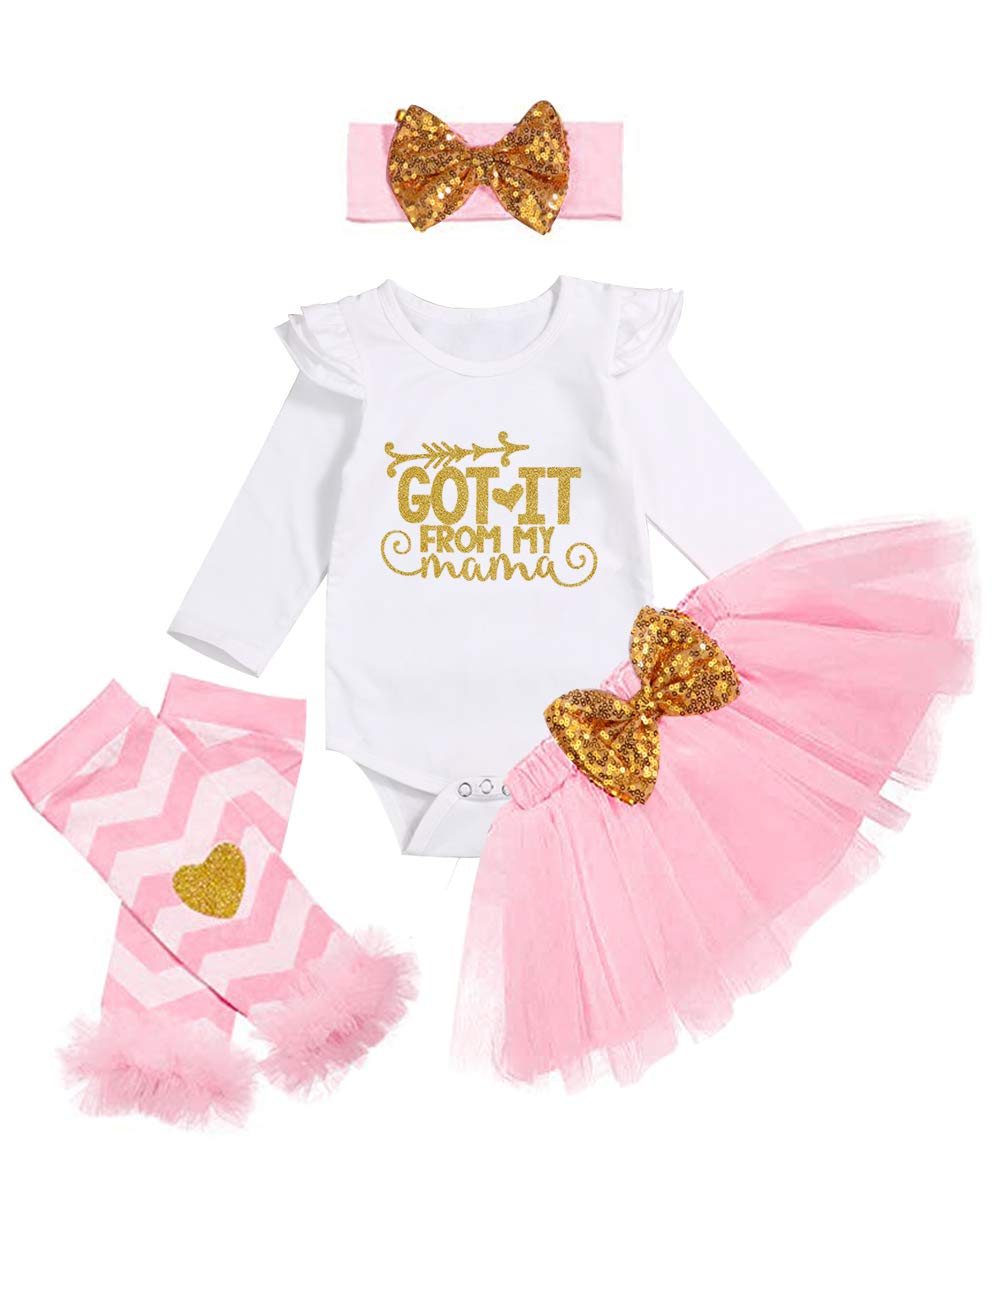 Emmababy Girls Halloween 3PCs Outfits Set Kids Shirt Tutu Skirt Dress Clothes